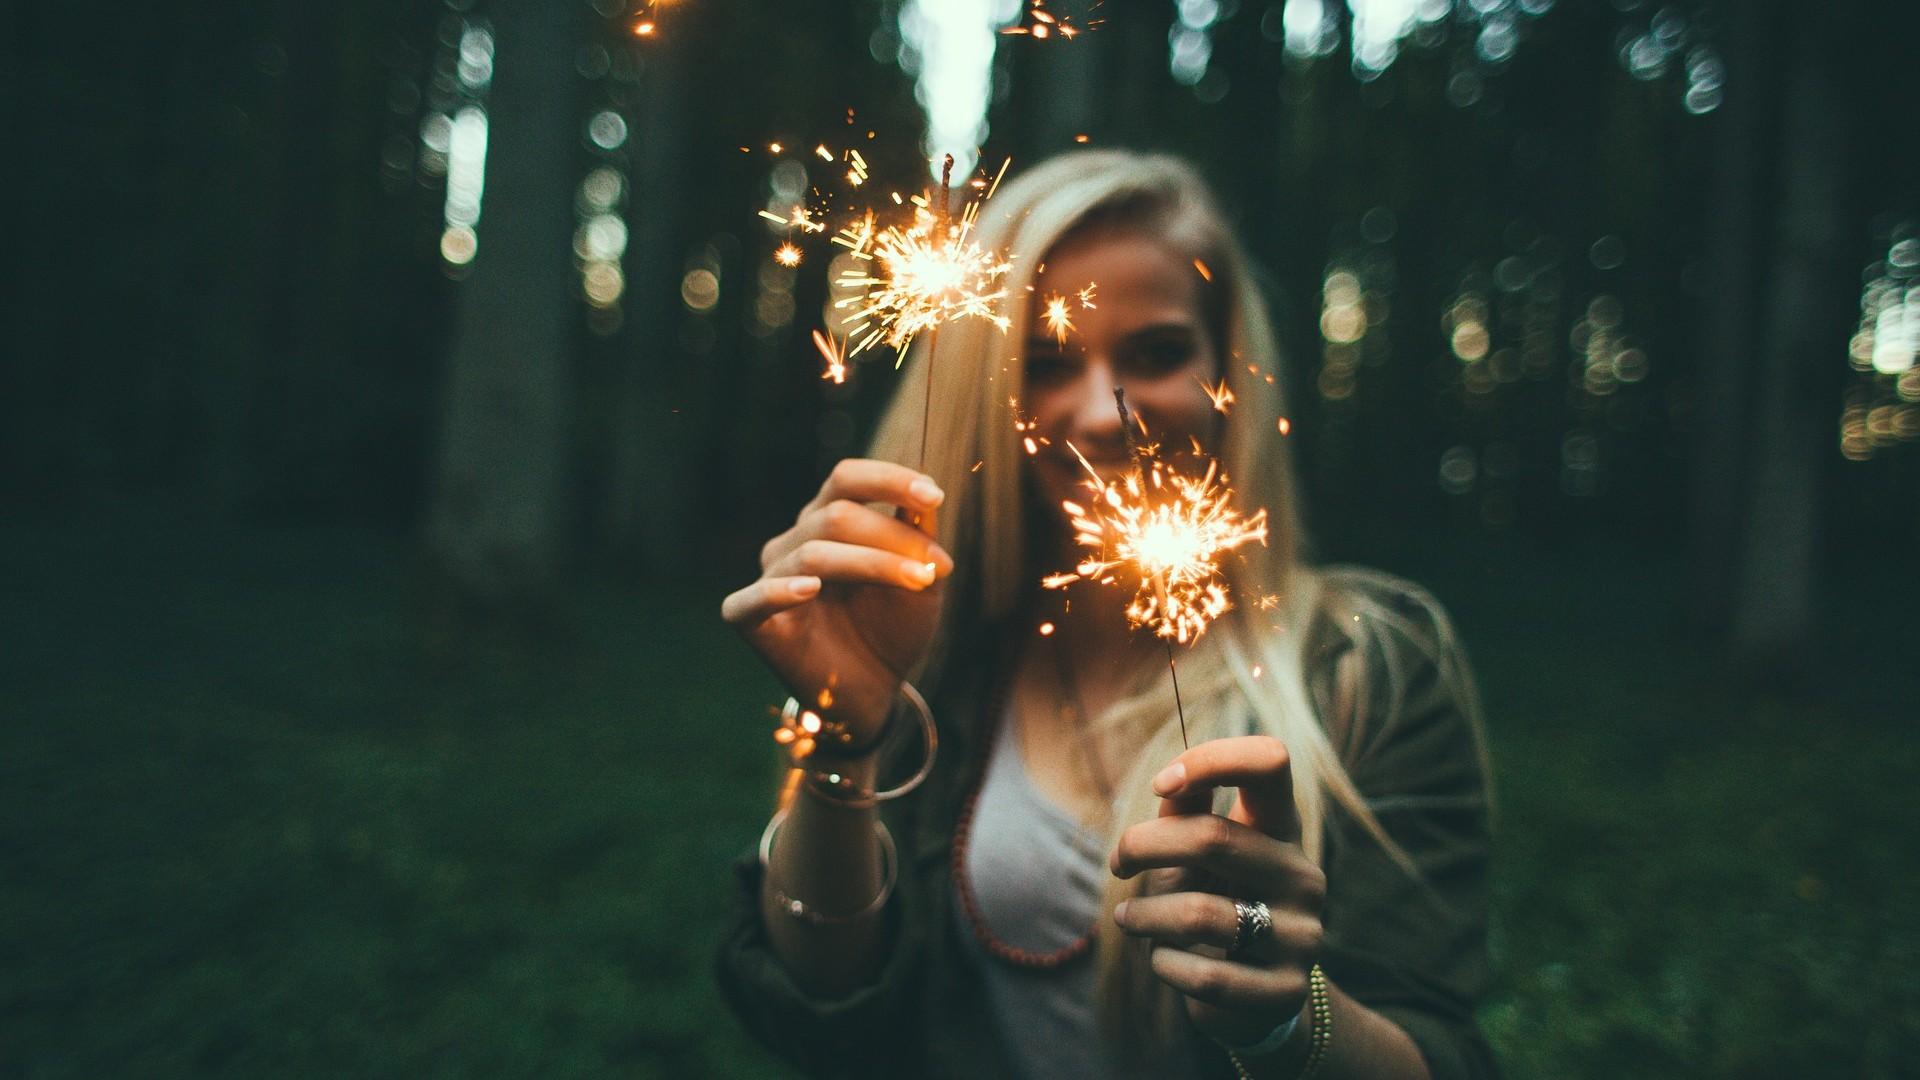 licht, lume, vrouw, sterretjes, 40-dagentijd, geloof